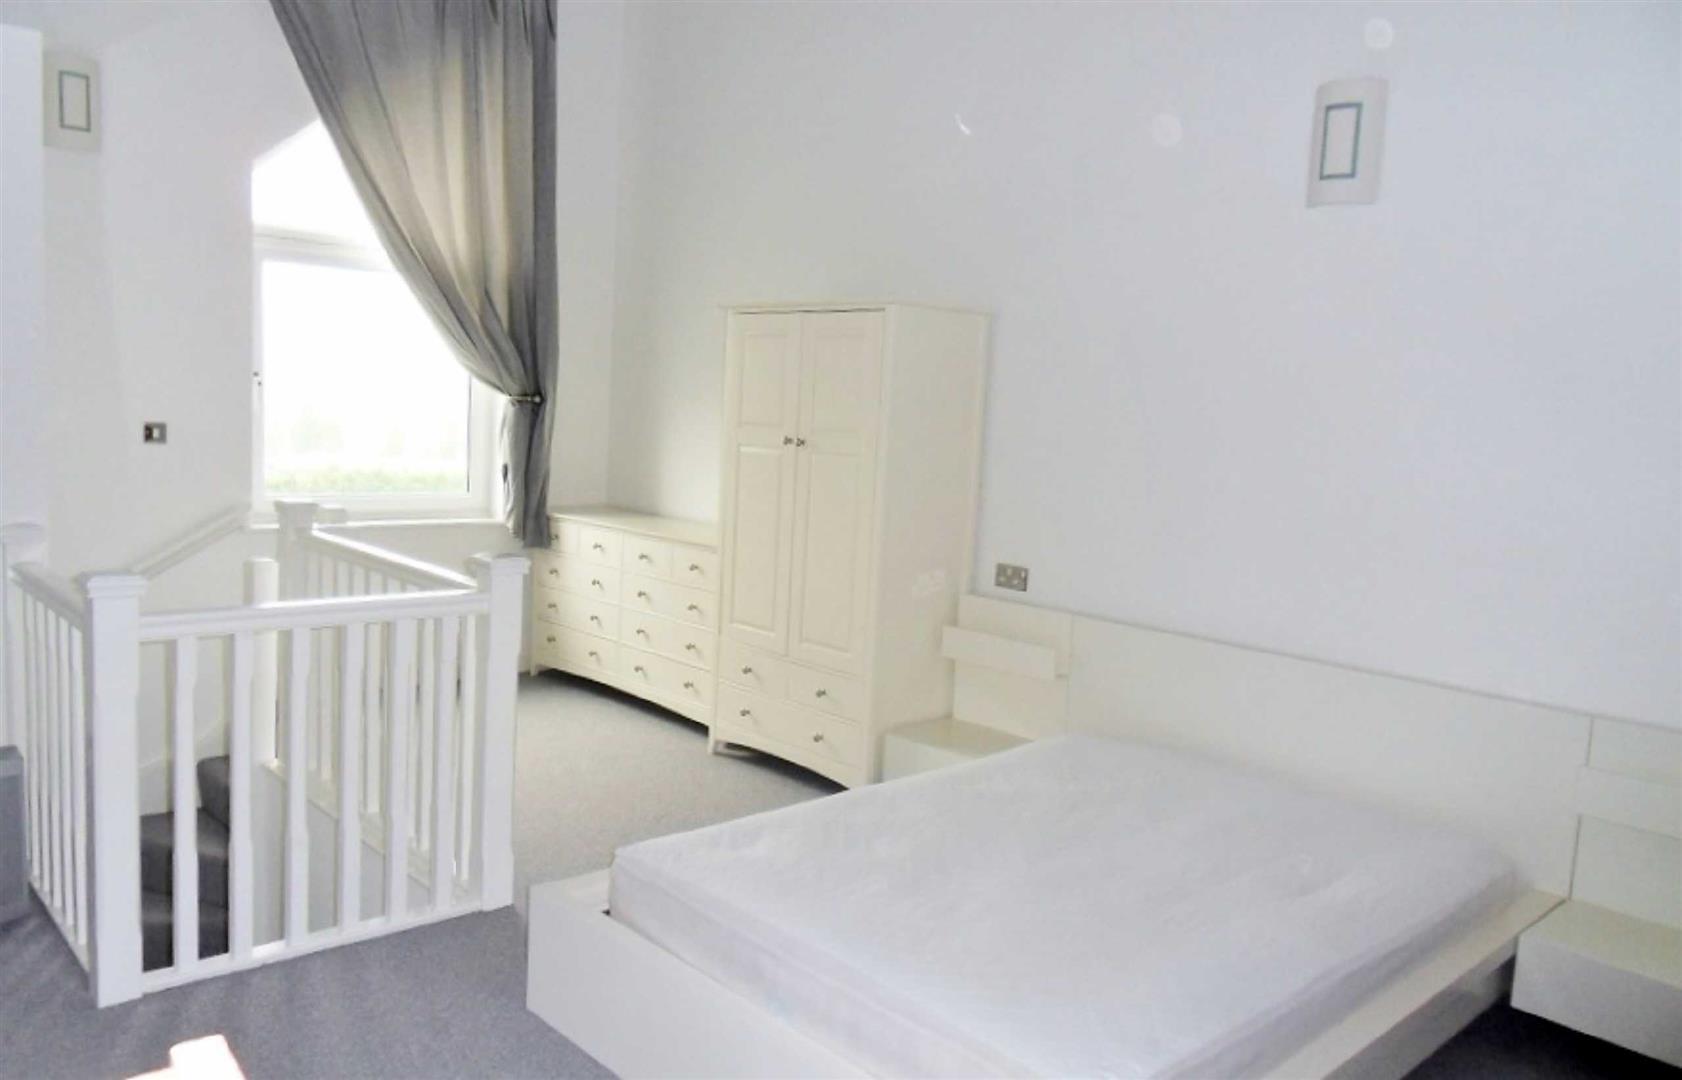 Victory Apartments, Copper Quarter, Swansea, SA1 7FD